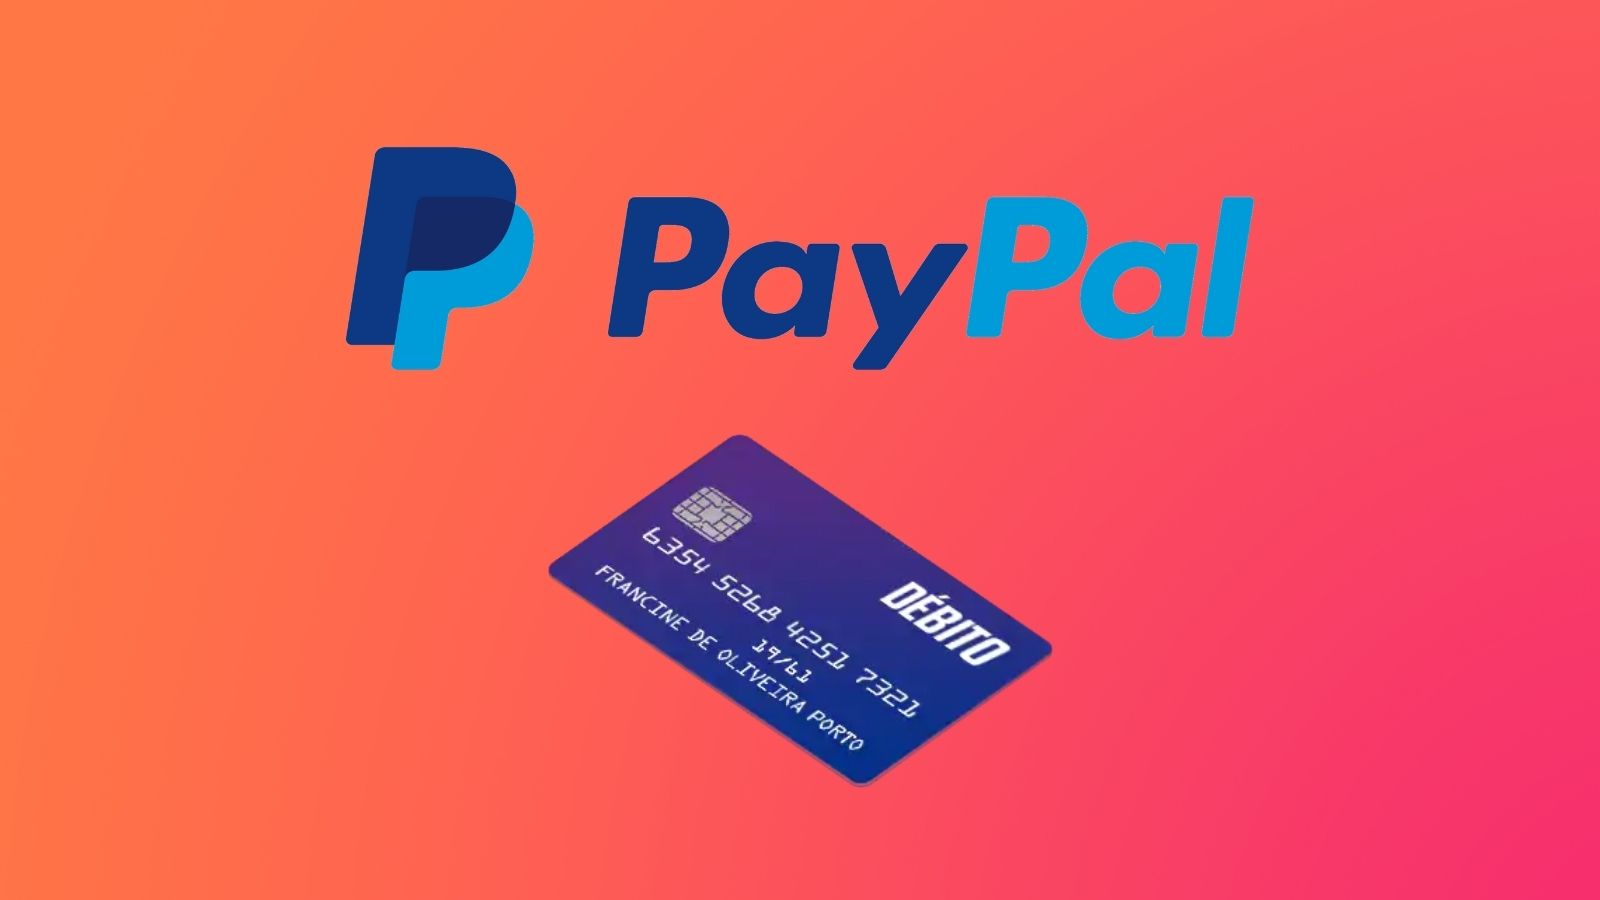 Imagem ilustrando o paypal débito